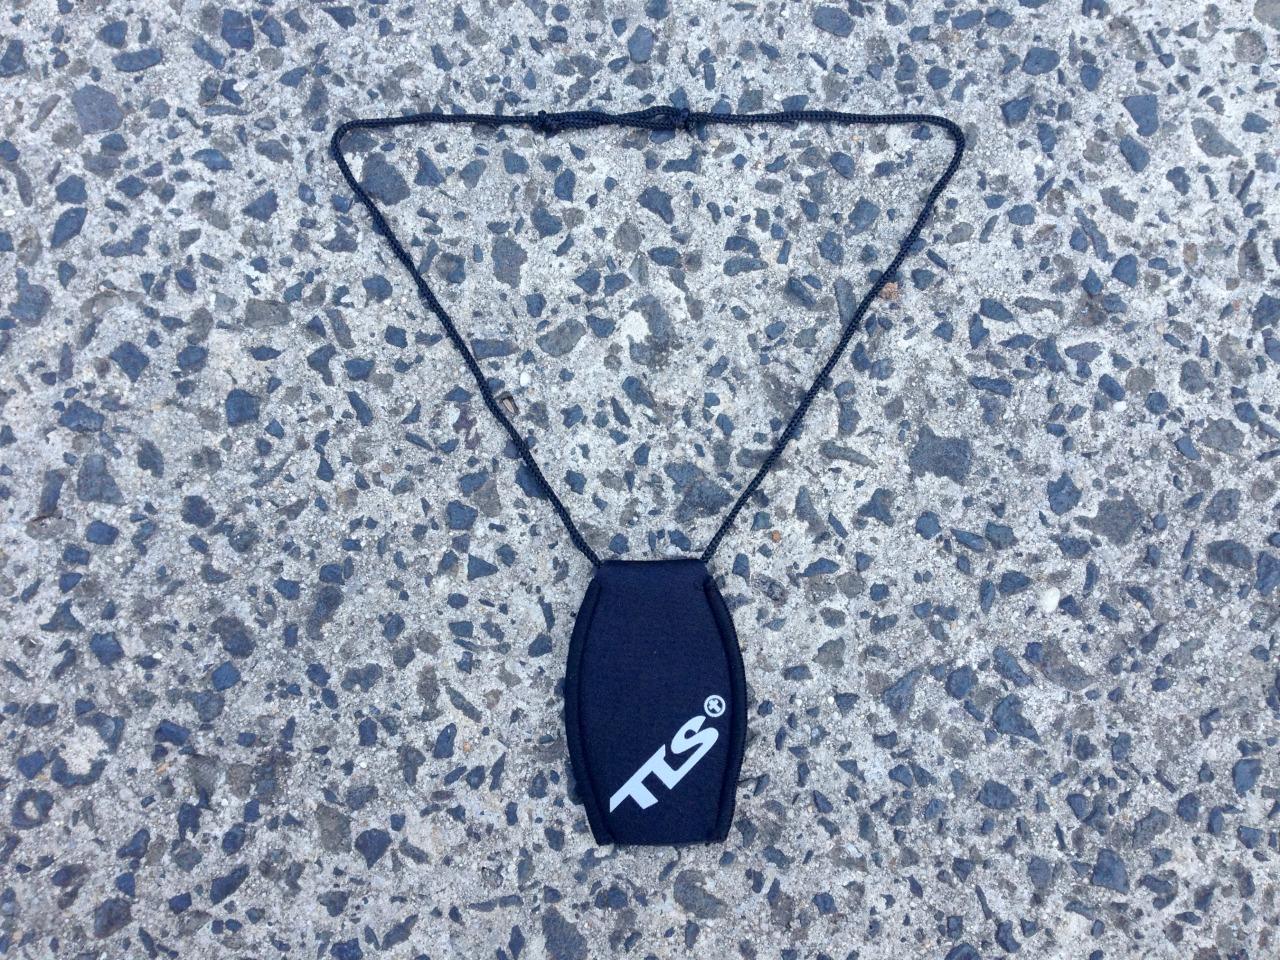 Tools Key Pocket 1